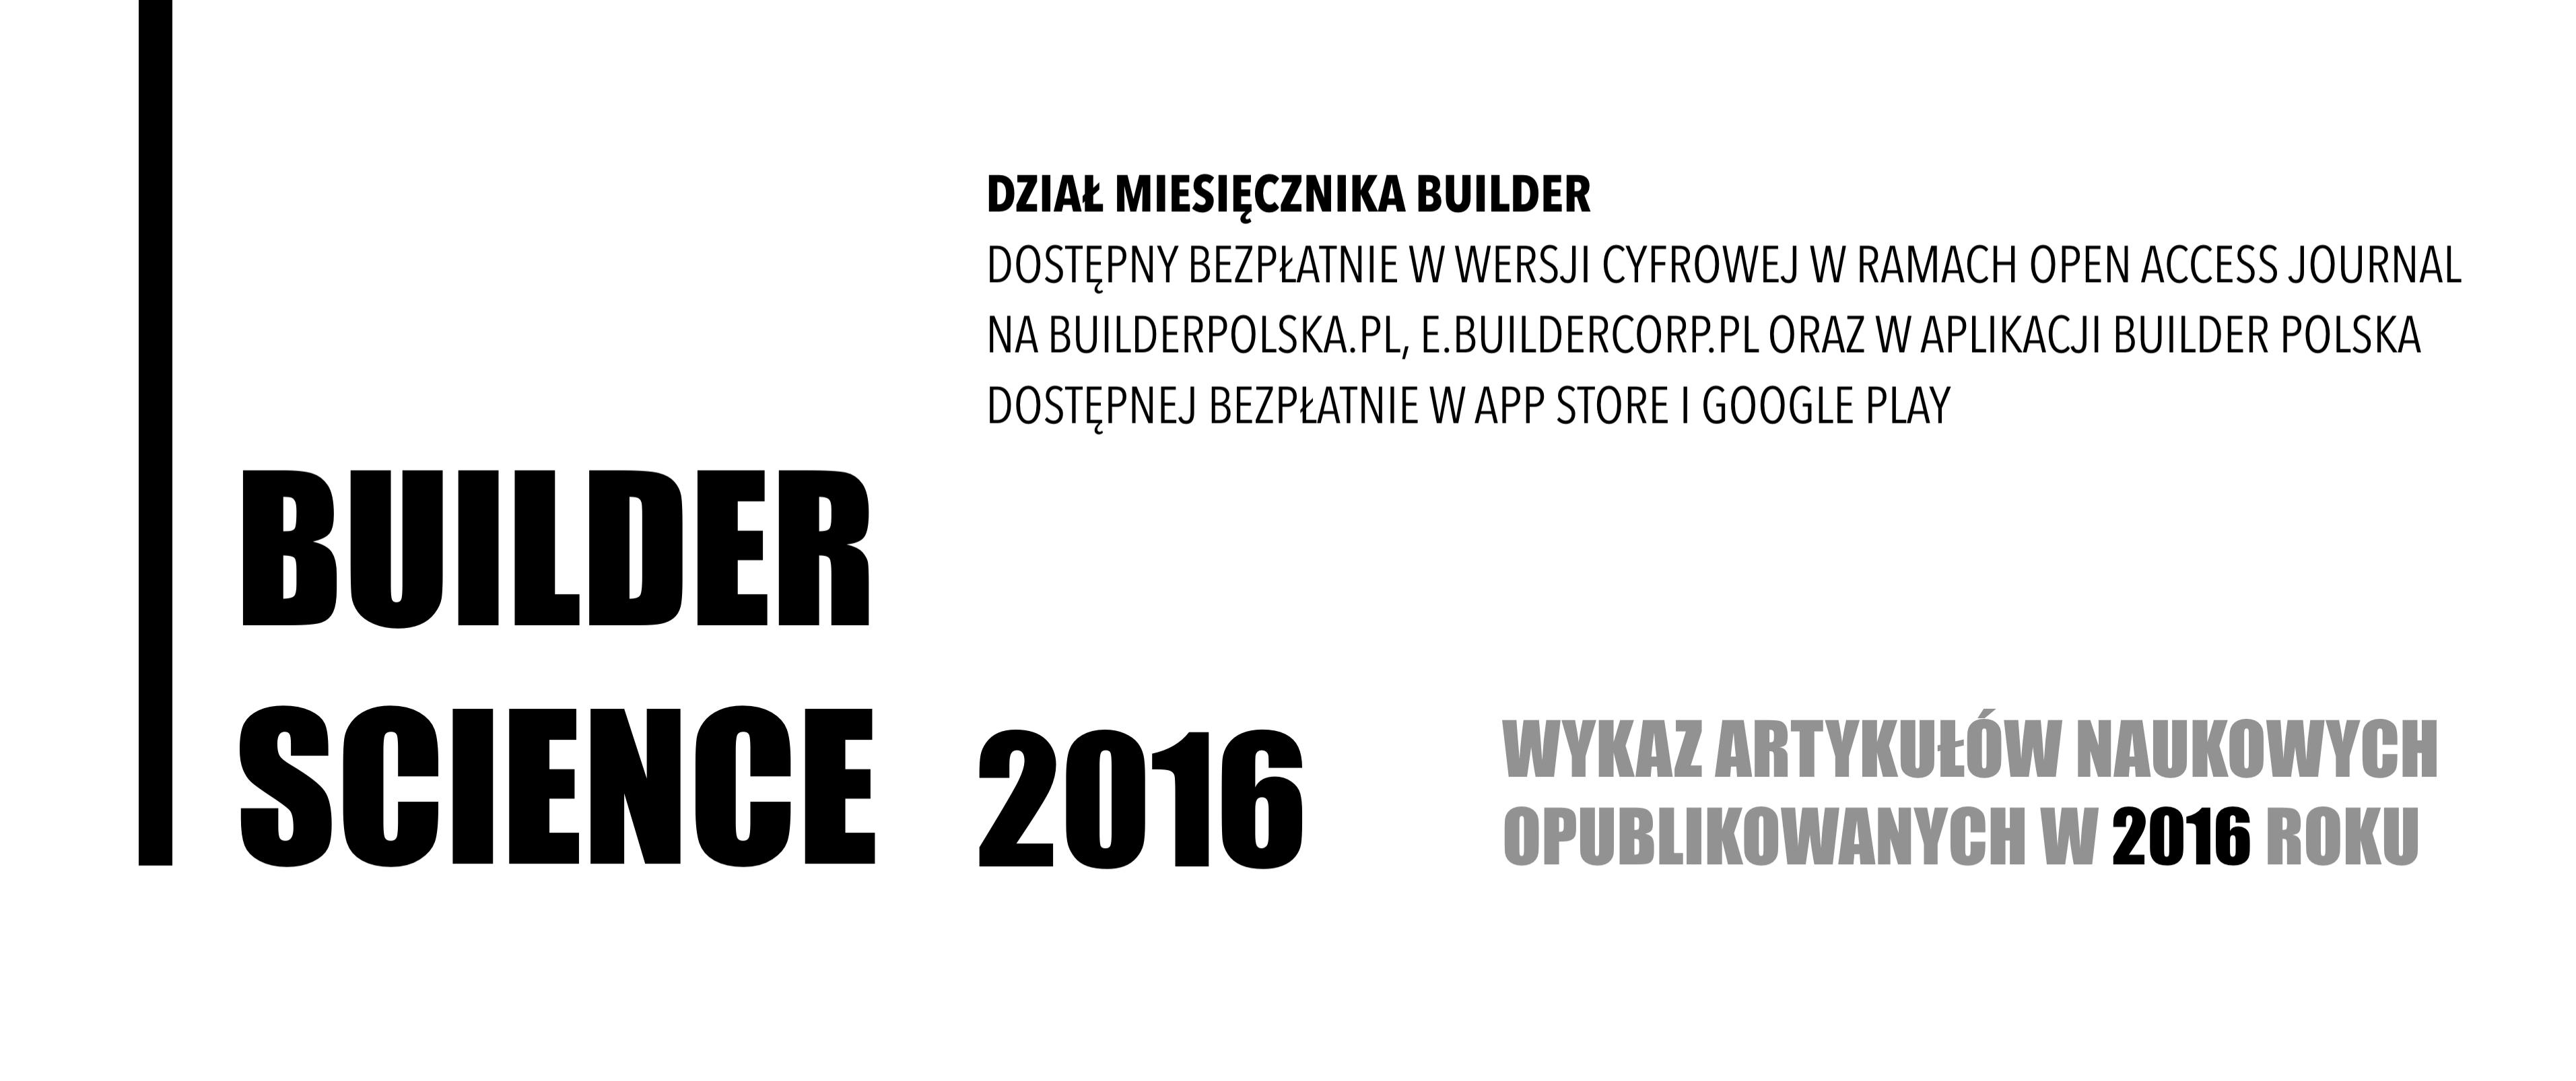 BUILDER SCIENCE 2016